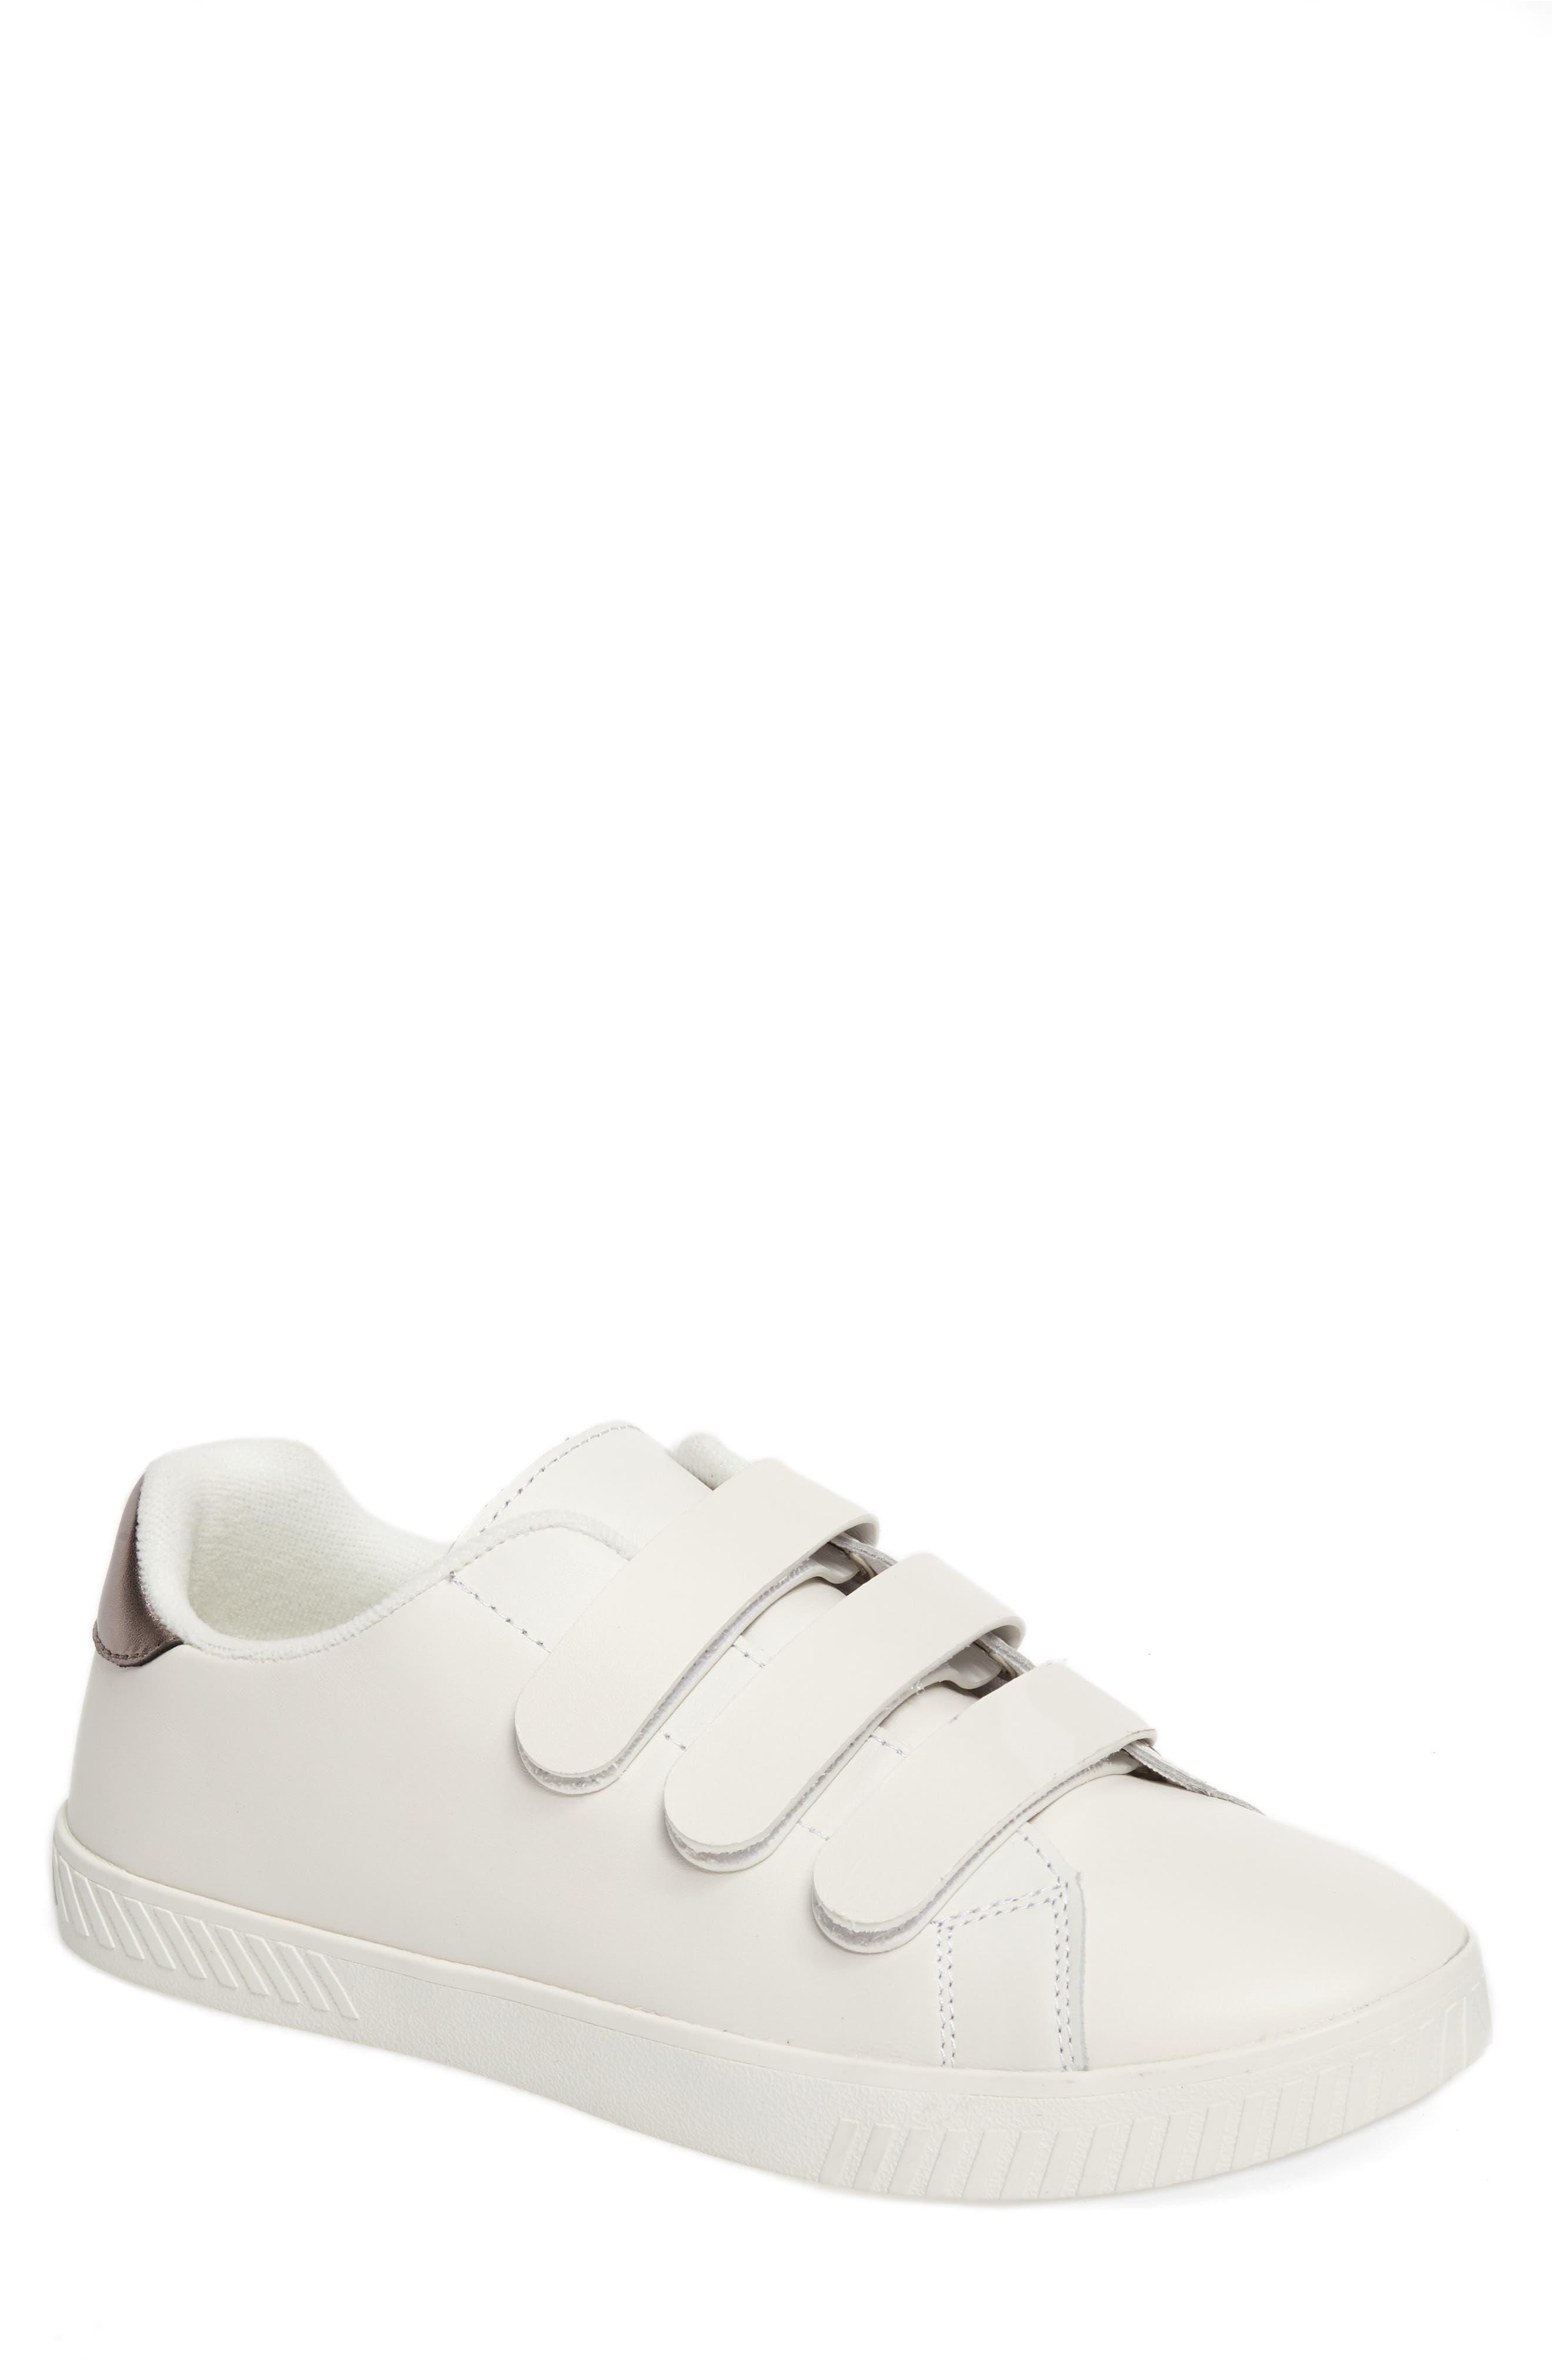 Main Image - Tretorn Carry 2 Sneaker (Men)